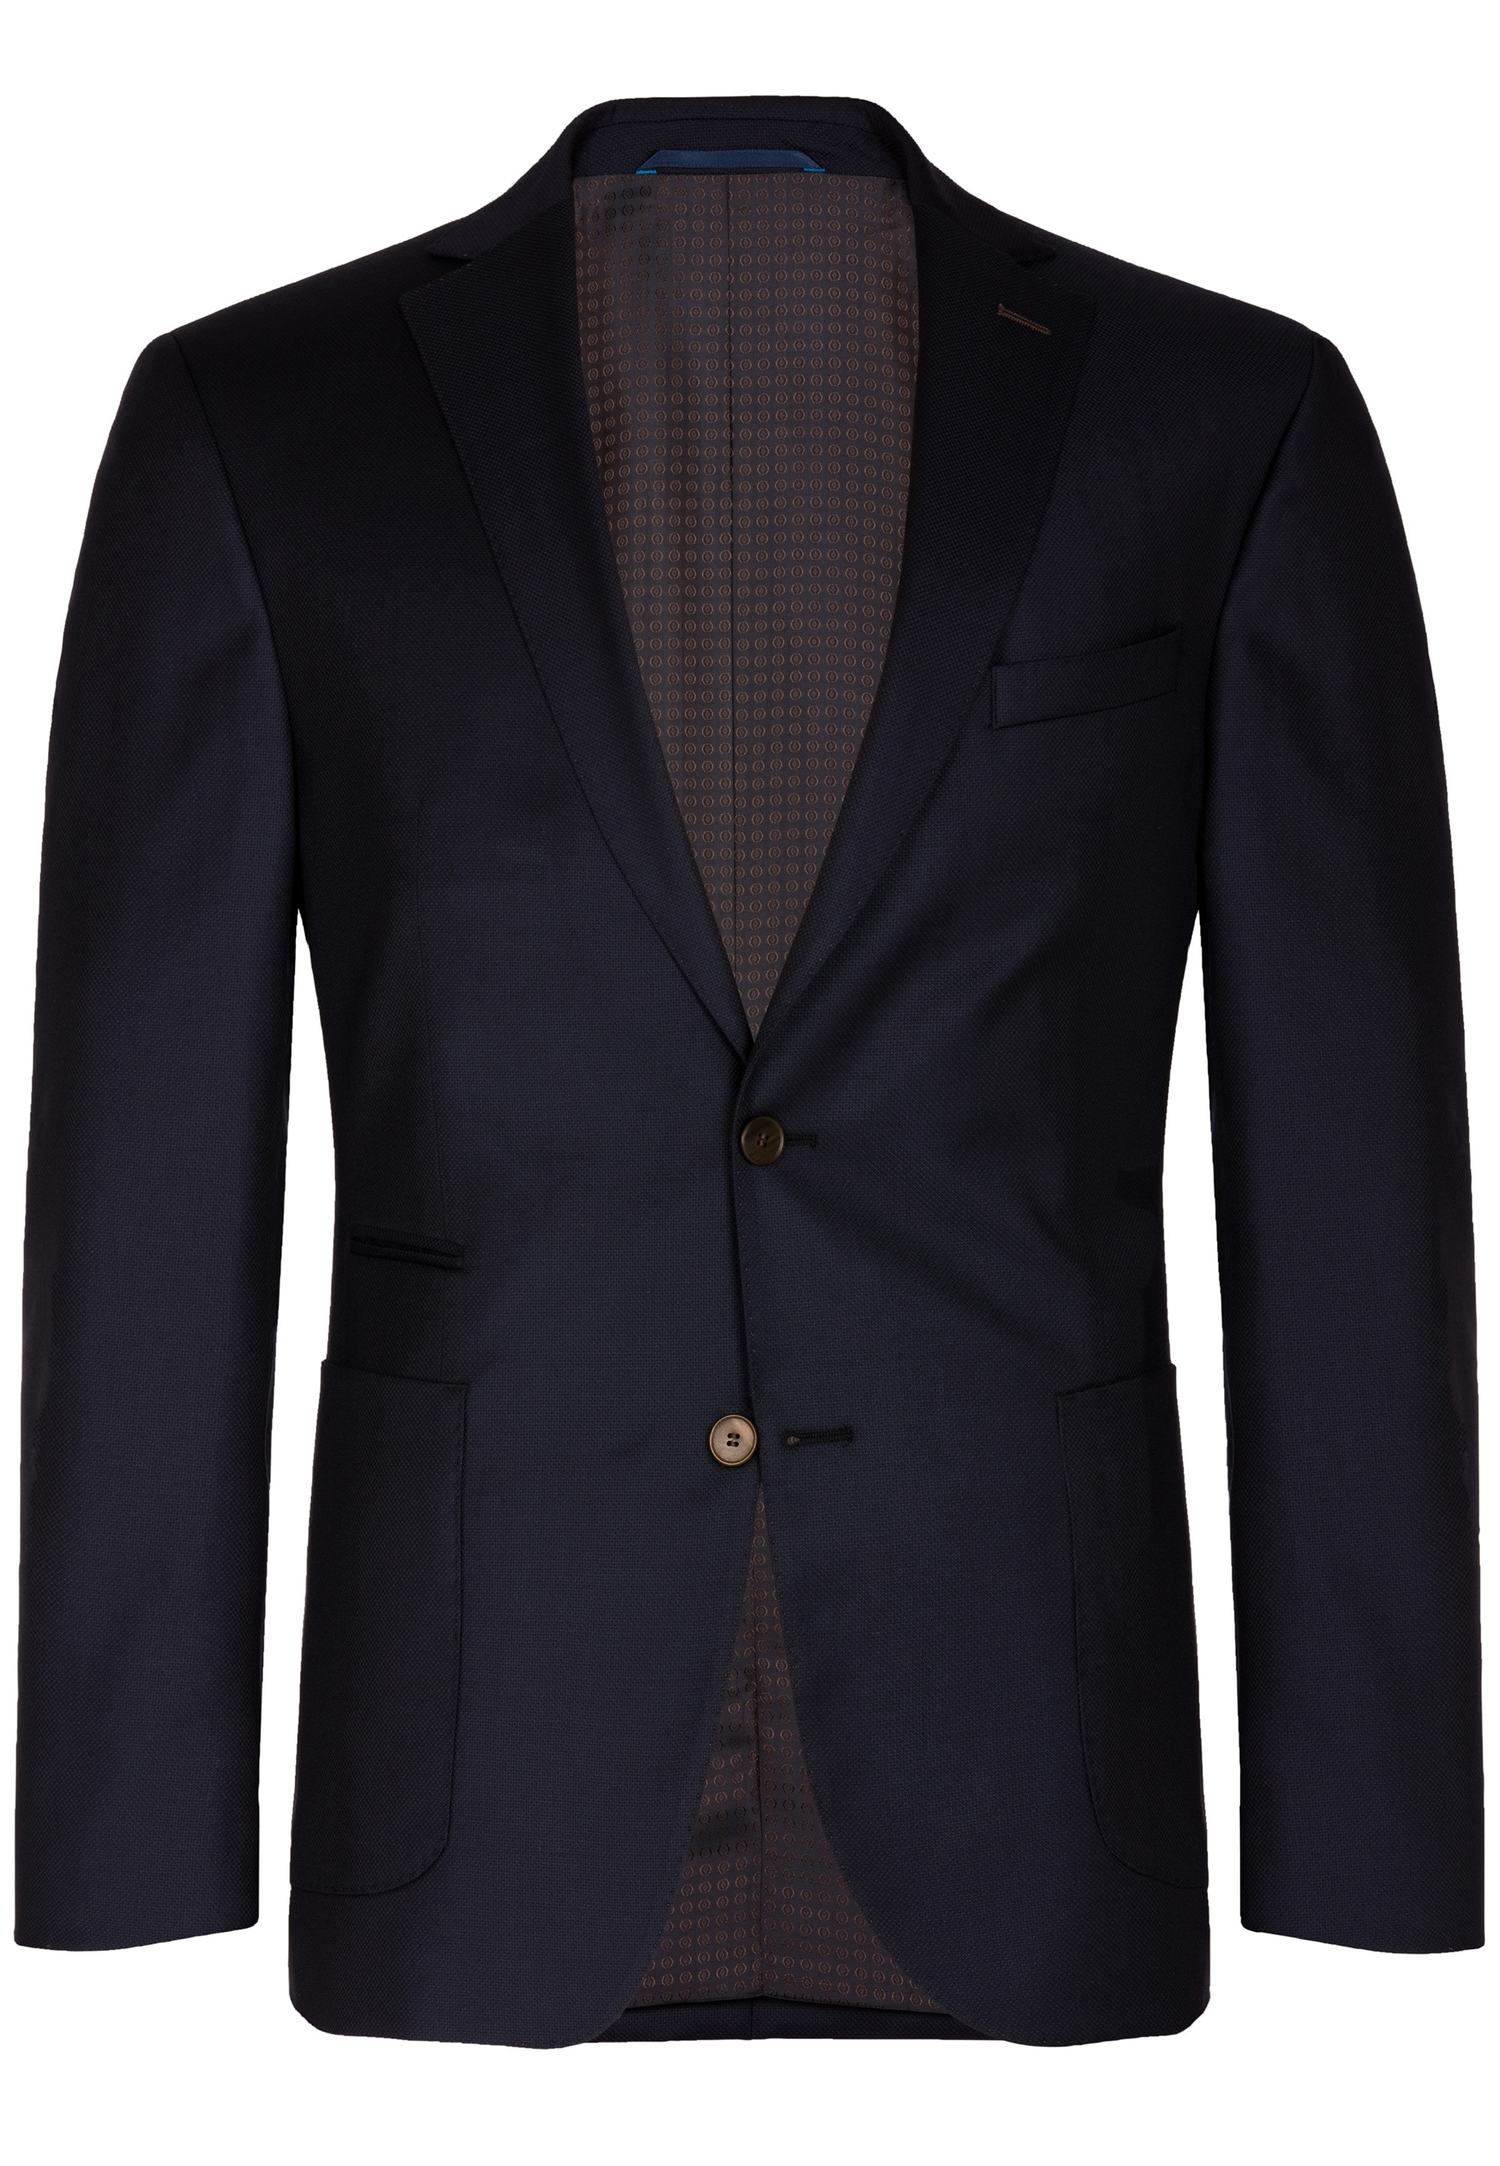 CARL GROSS Blazer »CG Fairbanks«   Bekleidung > Sakkos > Sonstige Sakkos   Blau   Schurwolle - Viskose   CARL GROSS